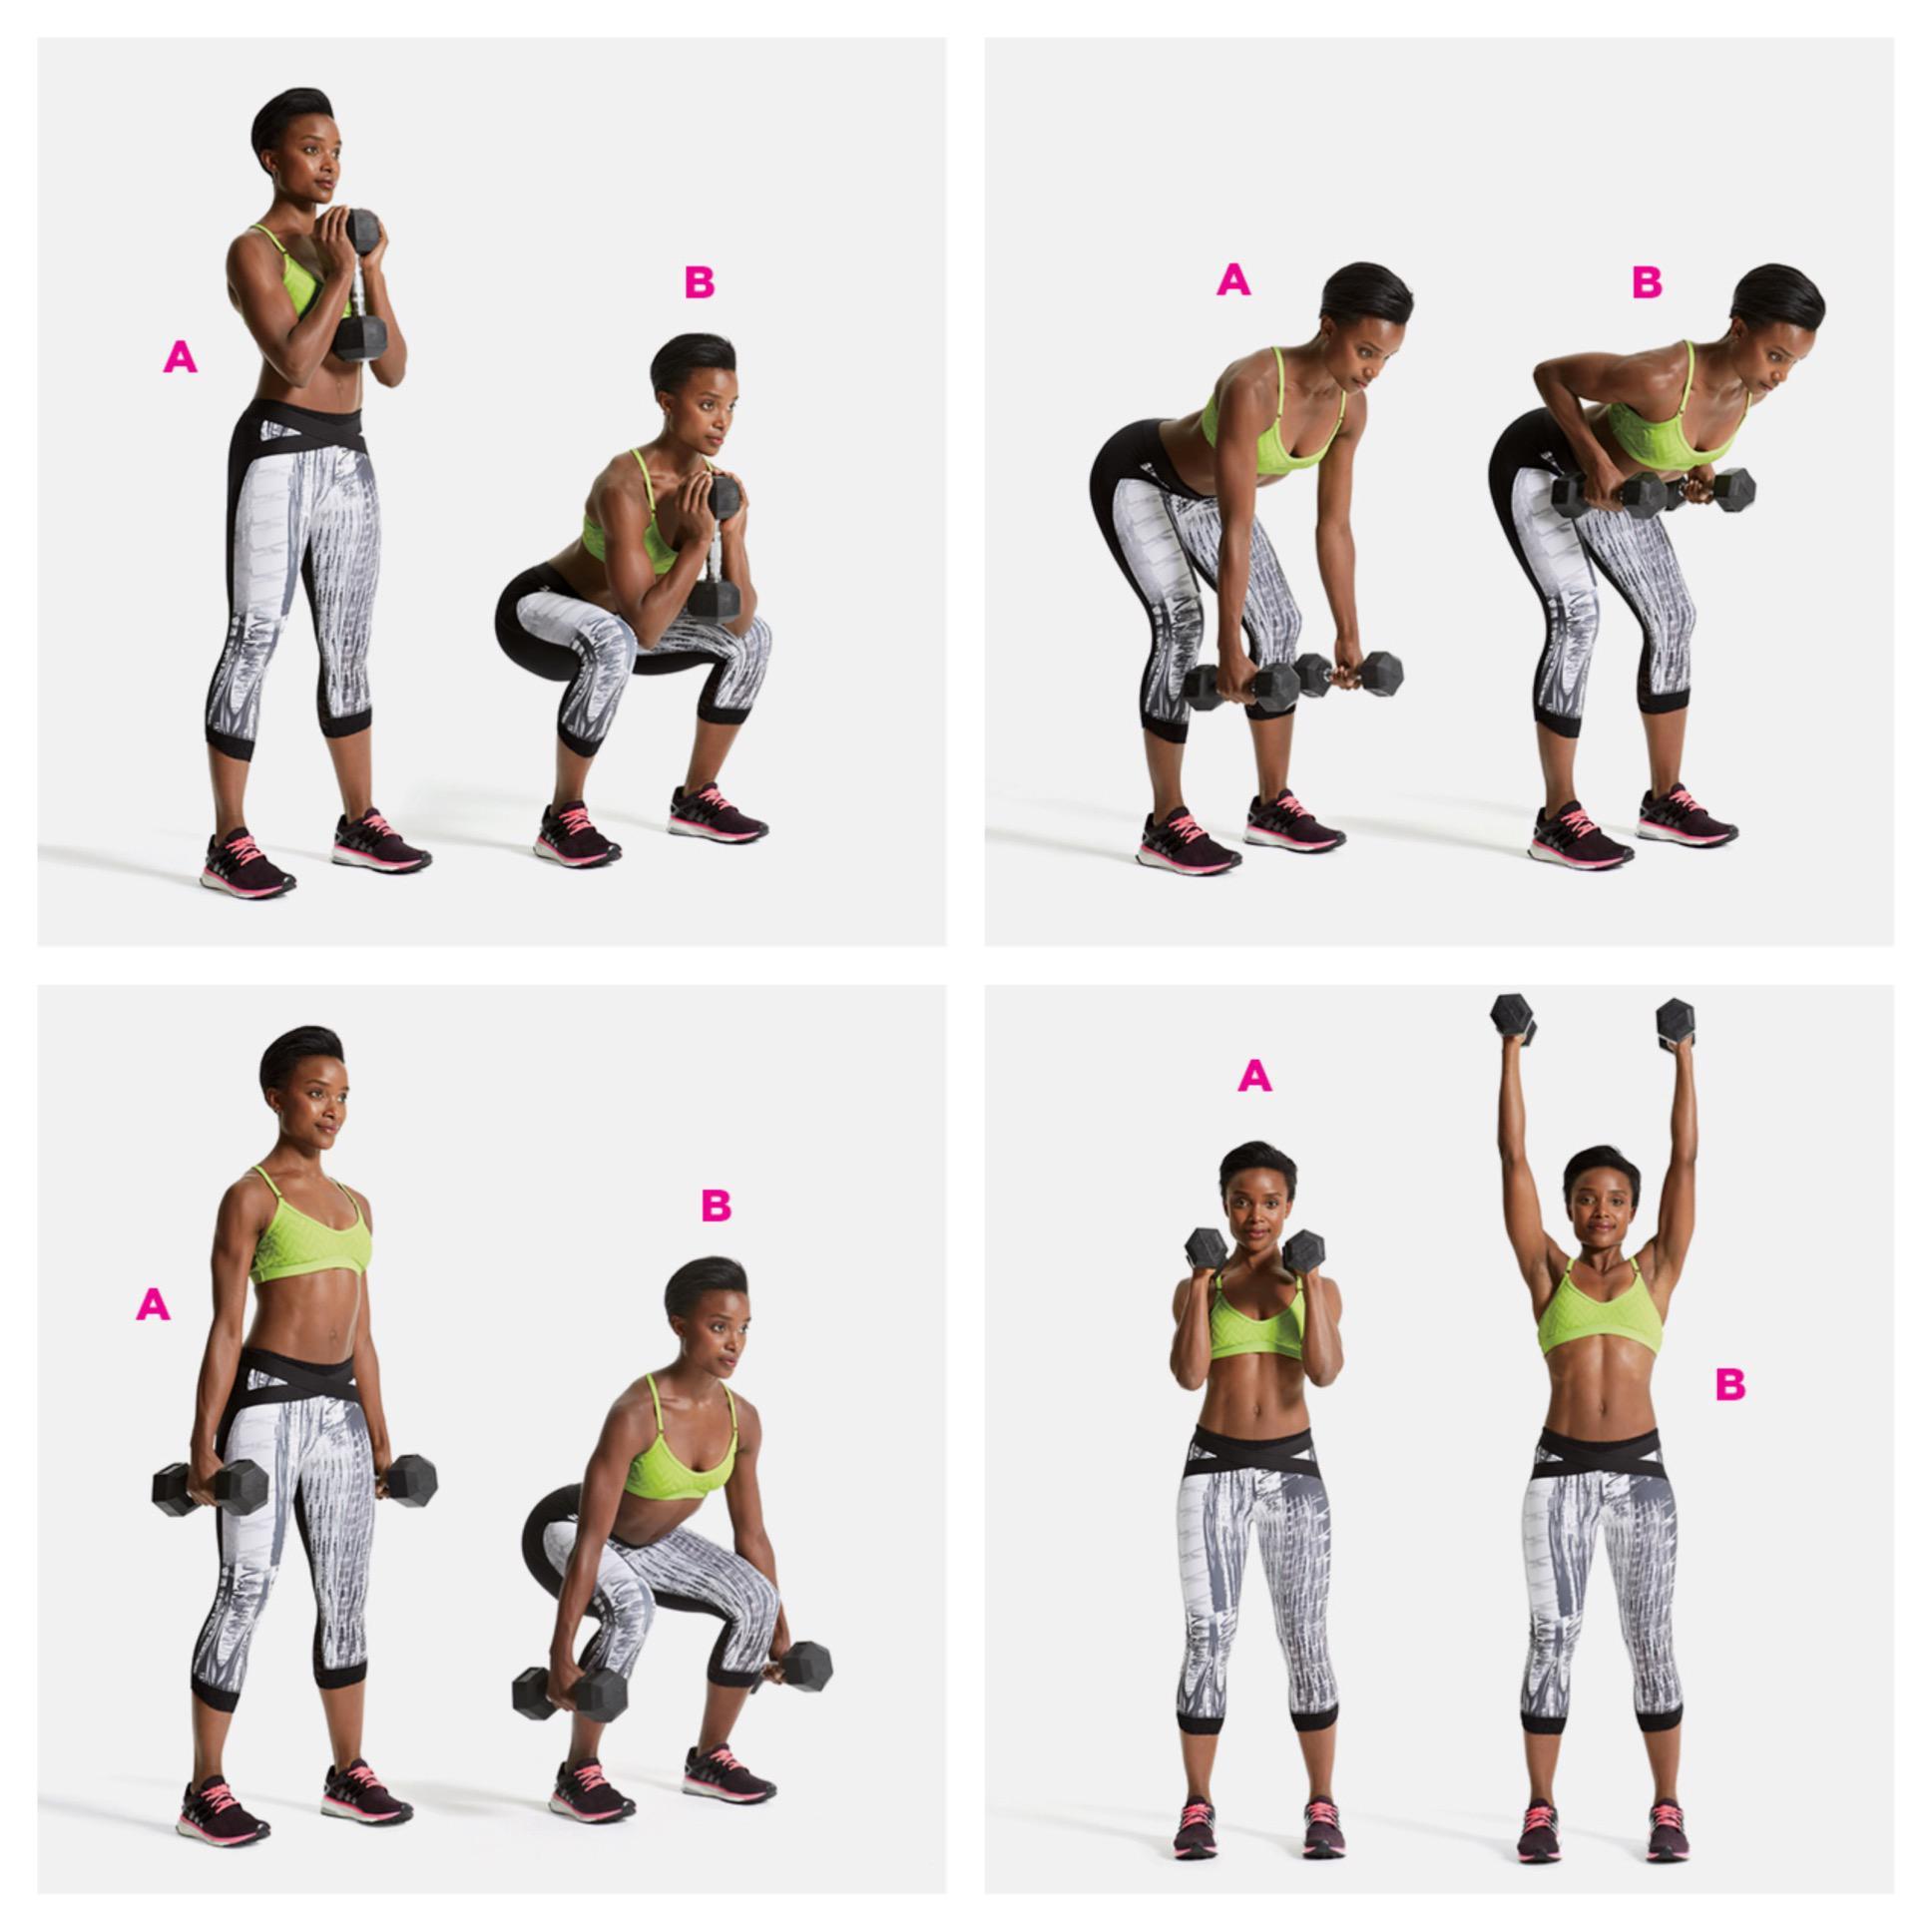 4 exercises you should do back-to-back: http://t.co/vZau9hUKfD